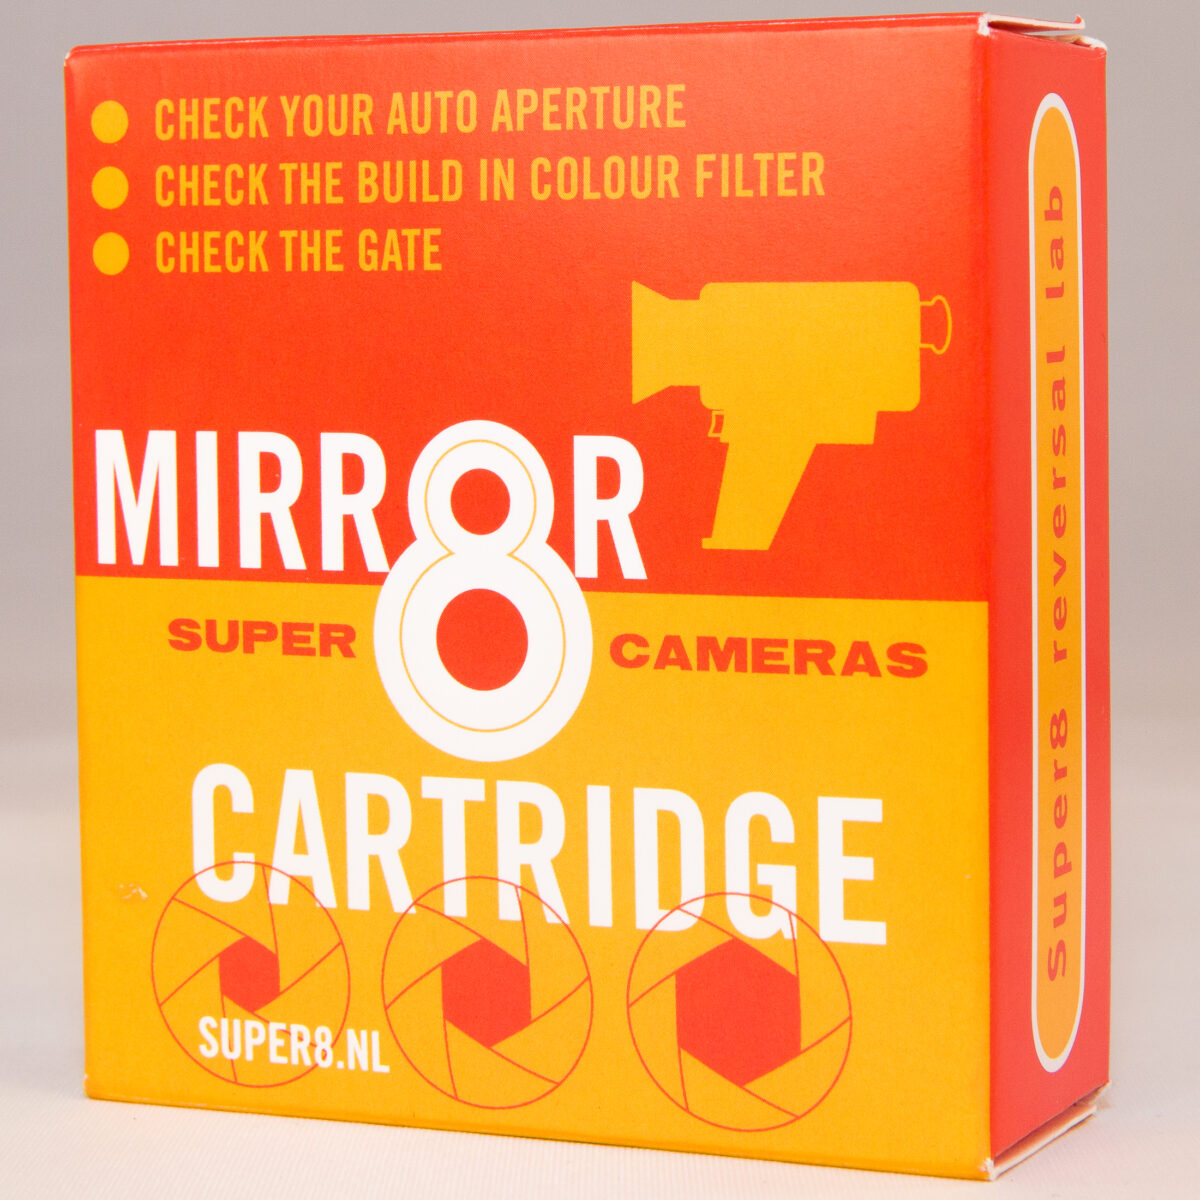 Mirror-Cartridge-Super8